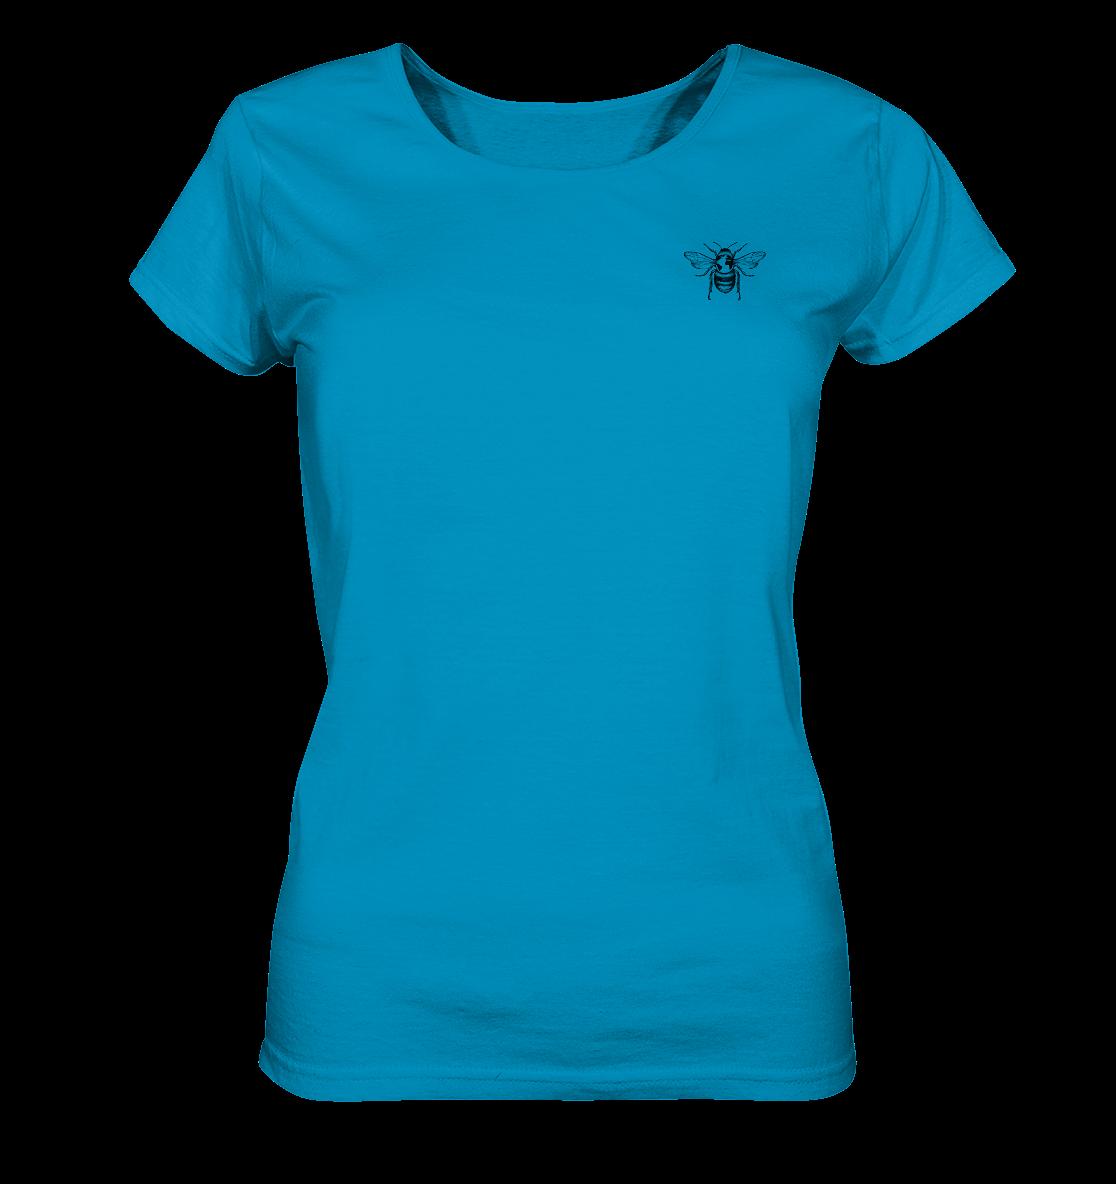 front-ladies-organic-shirt-0092c0-1116x.png